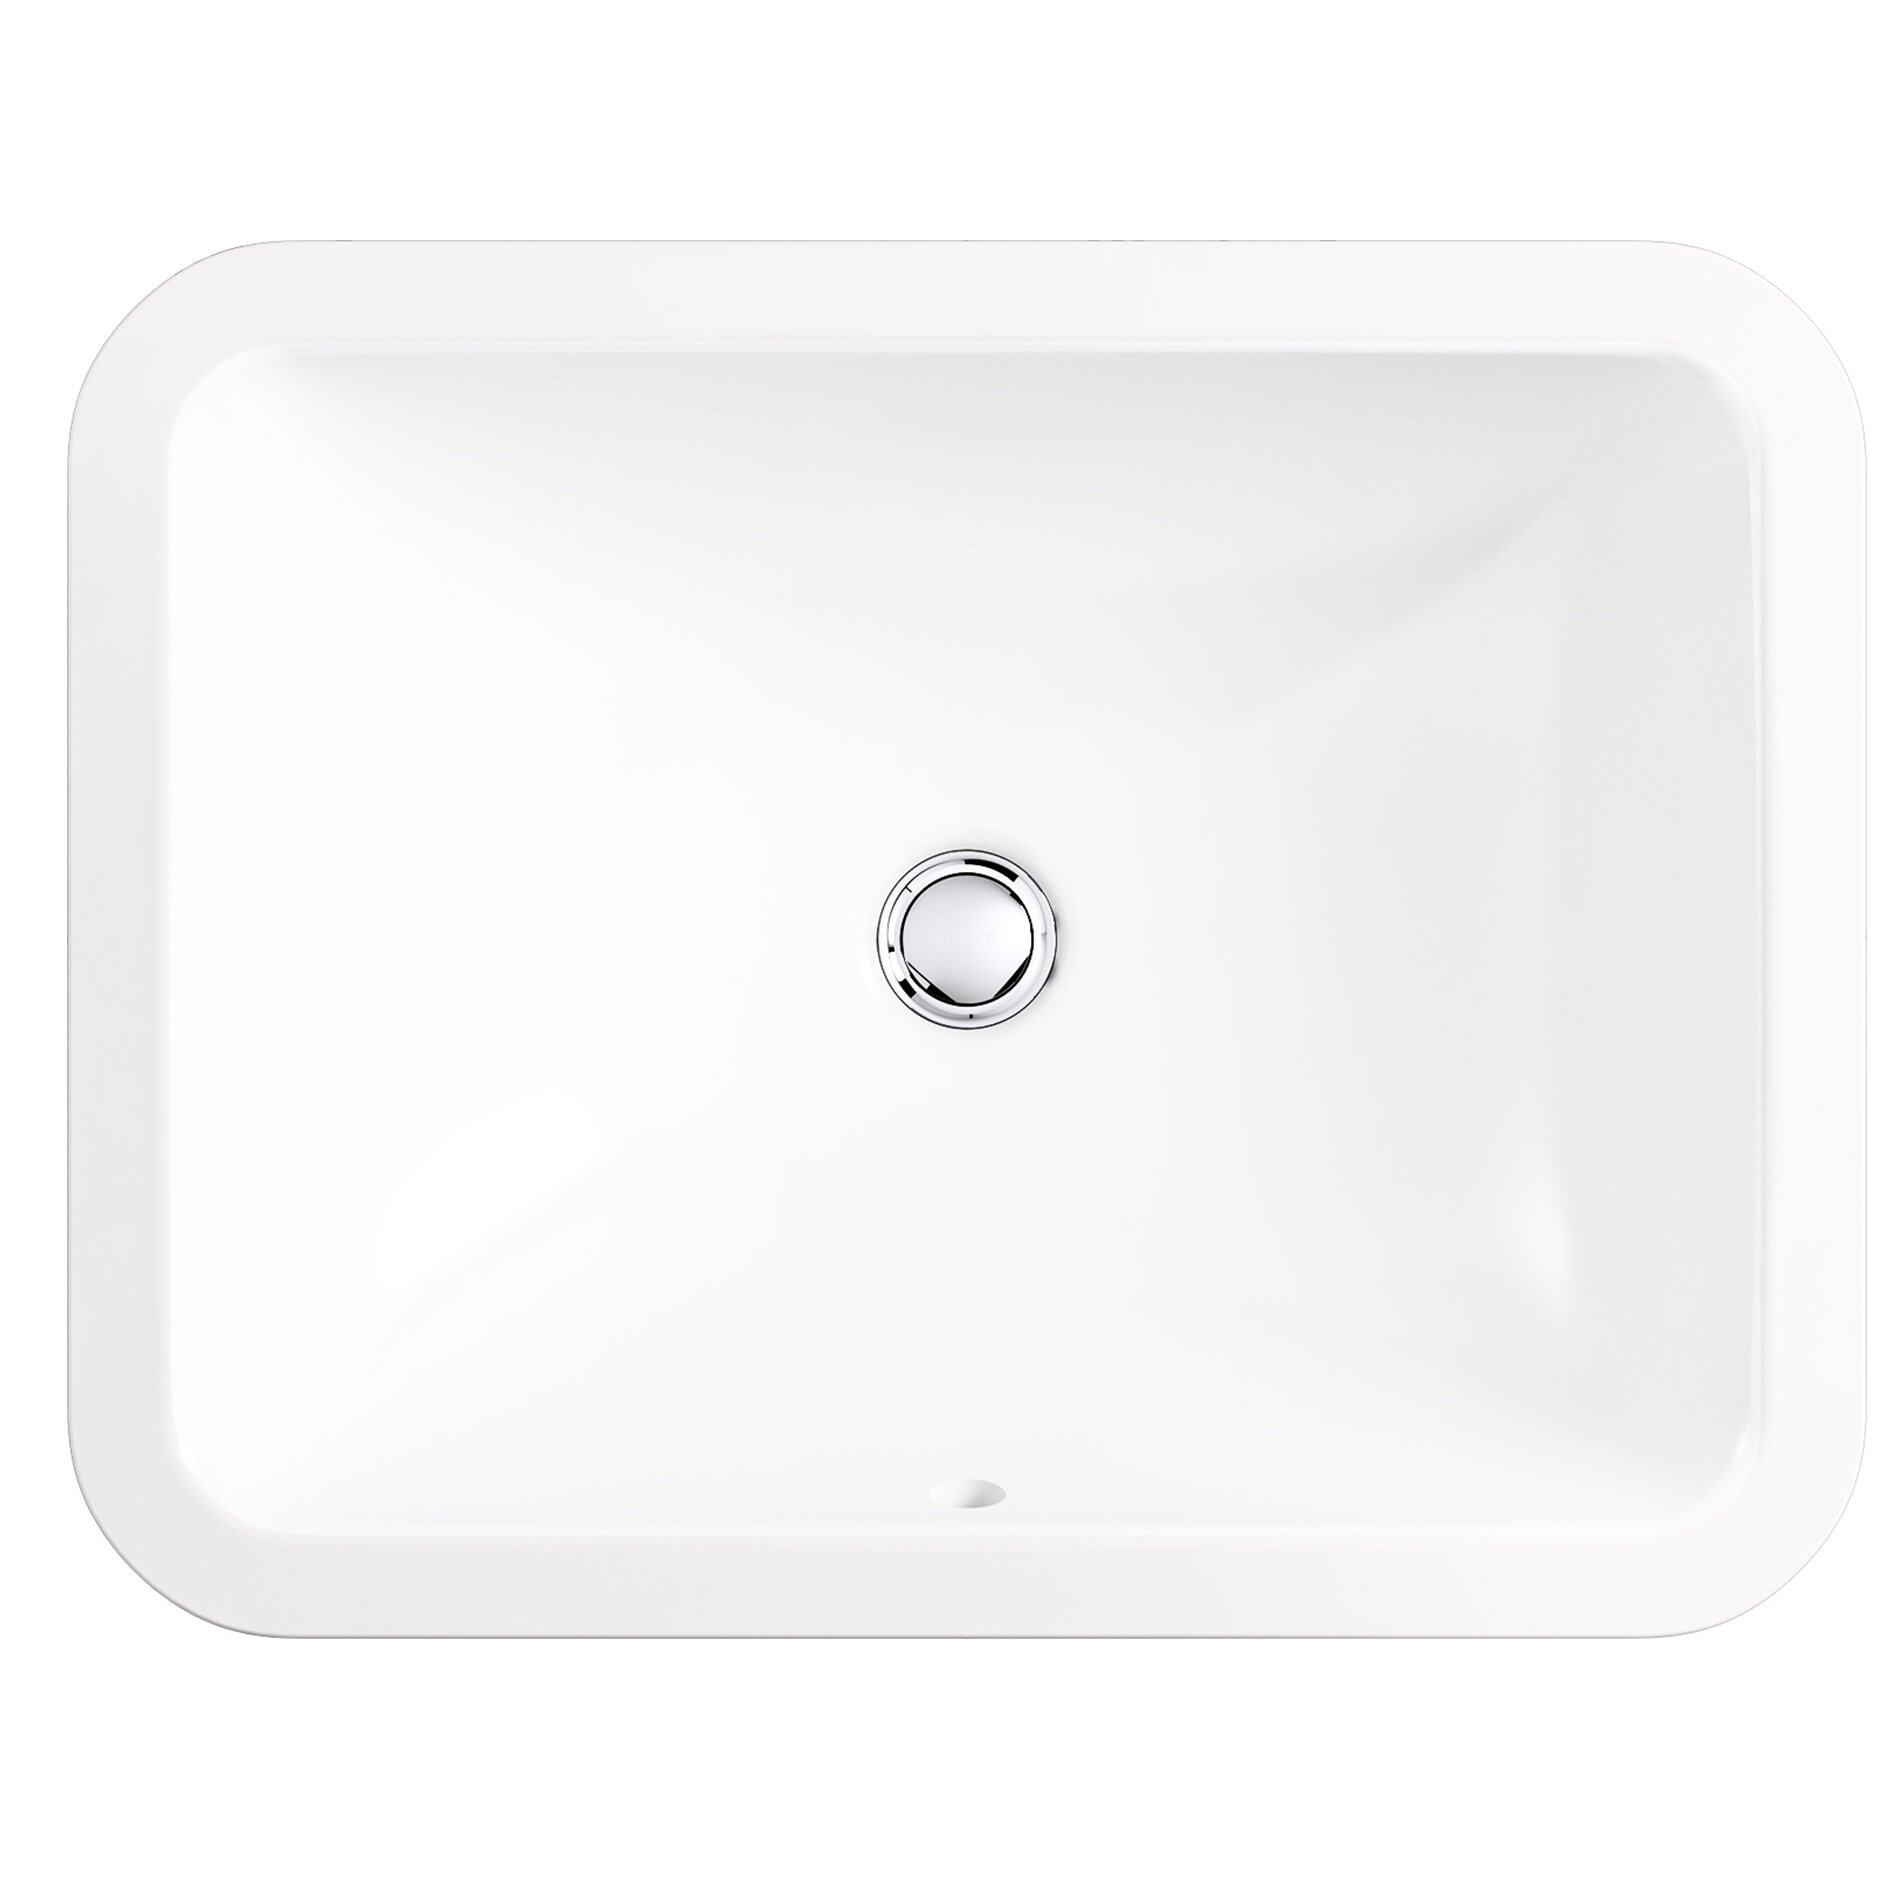 Kohler Undermount Bathroom Sinks Reviews rectangle undermount bathroom sink ~ dact